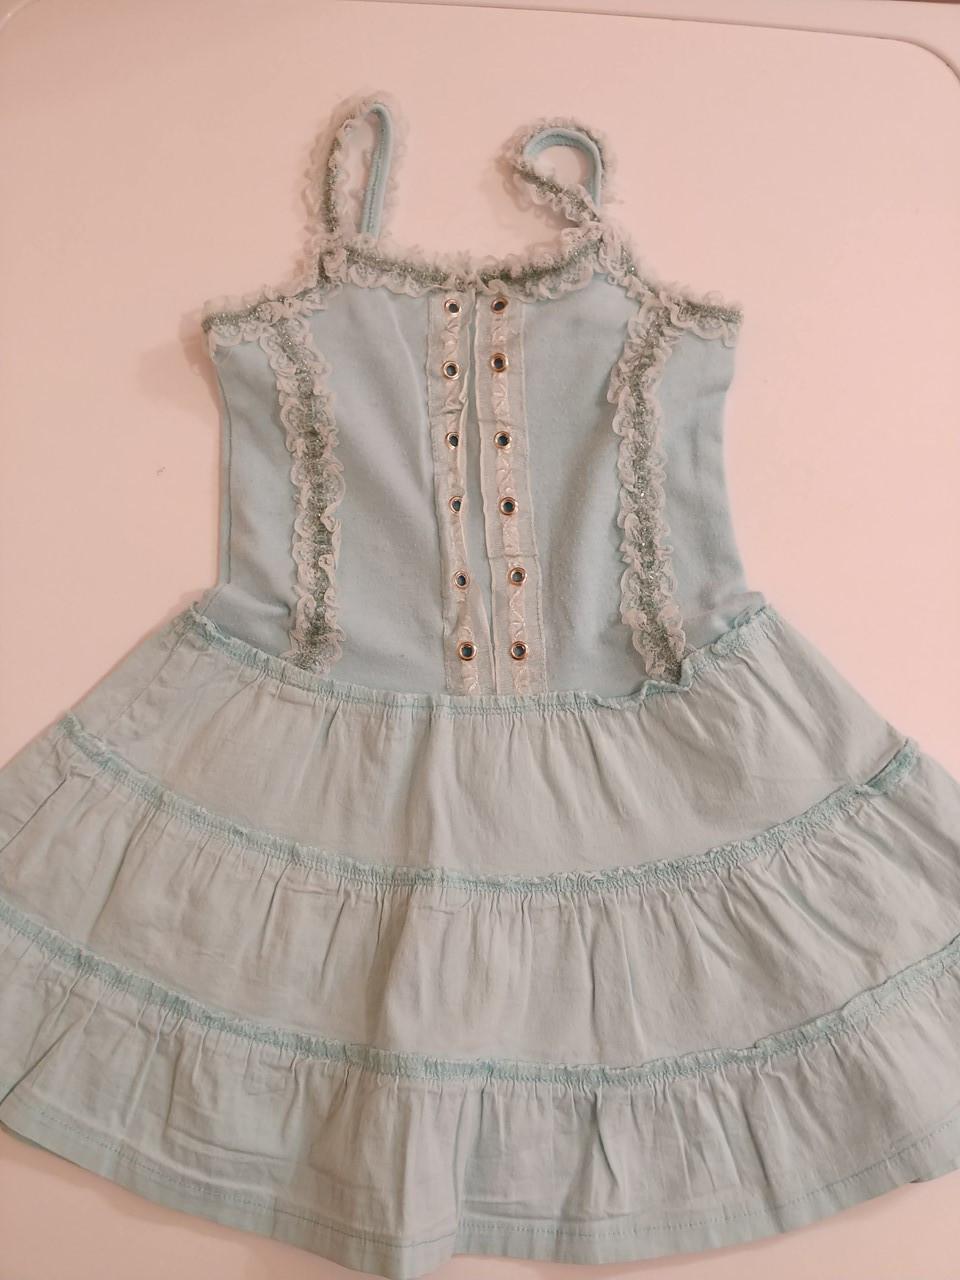 87f20118a25 ΧΑΡΙΖΩ] Καλοκαιρινά φορεματάκια για κορίτσι έως 2 ετών (vol.1 ...